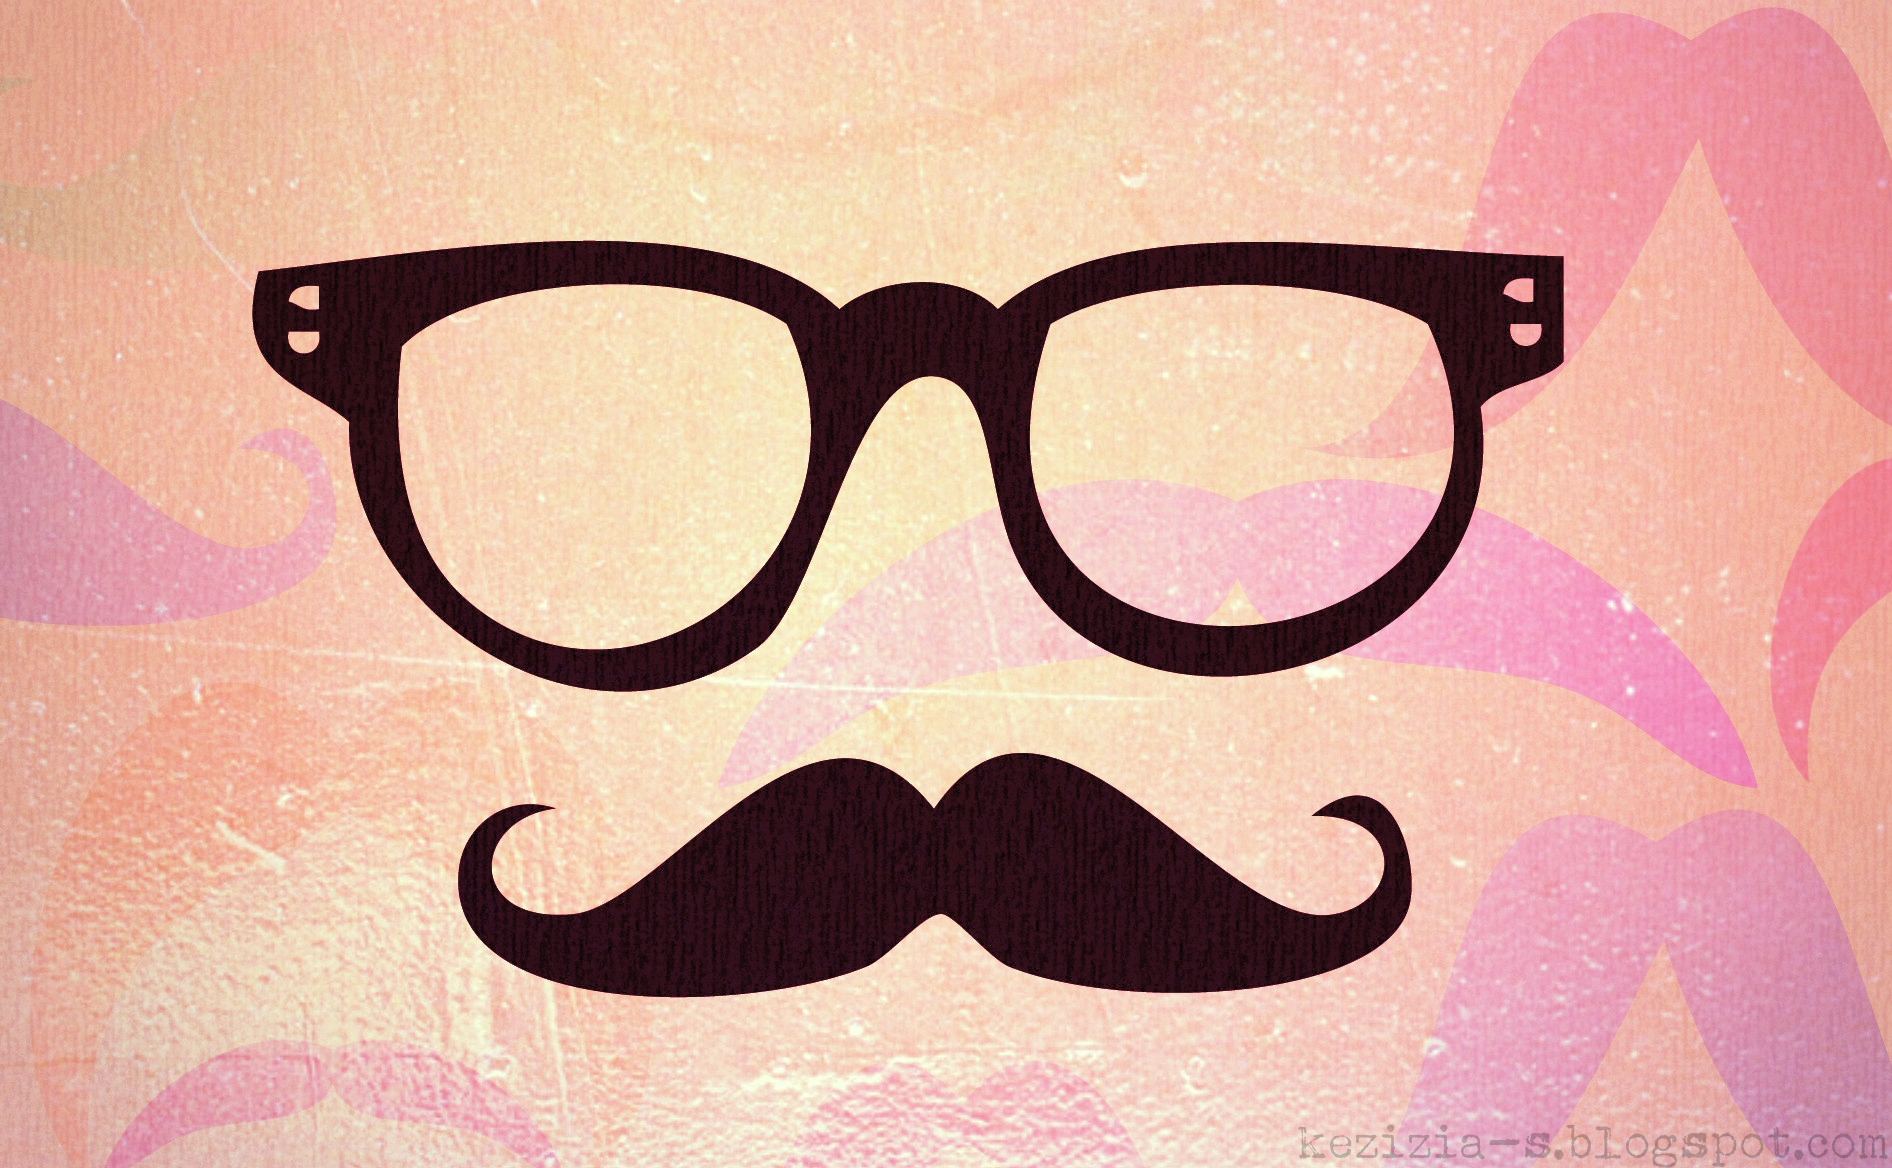 Wallpaper iphone kumis - Galaxy Kumis Background Twitter Mustache Backgrounds Mustache